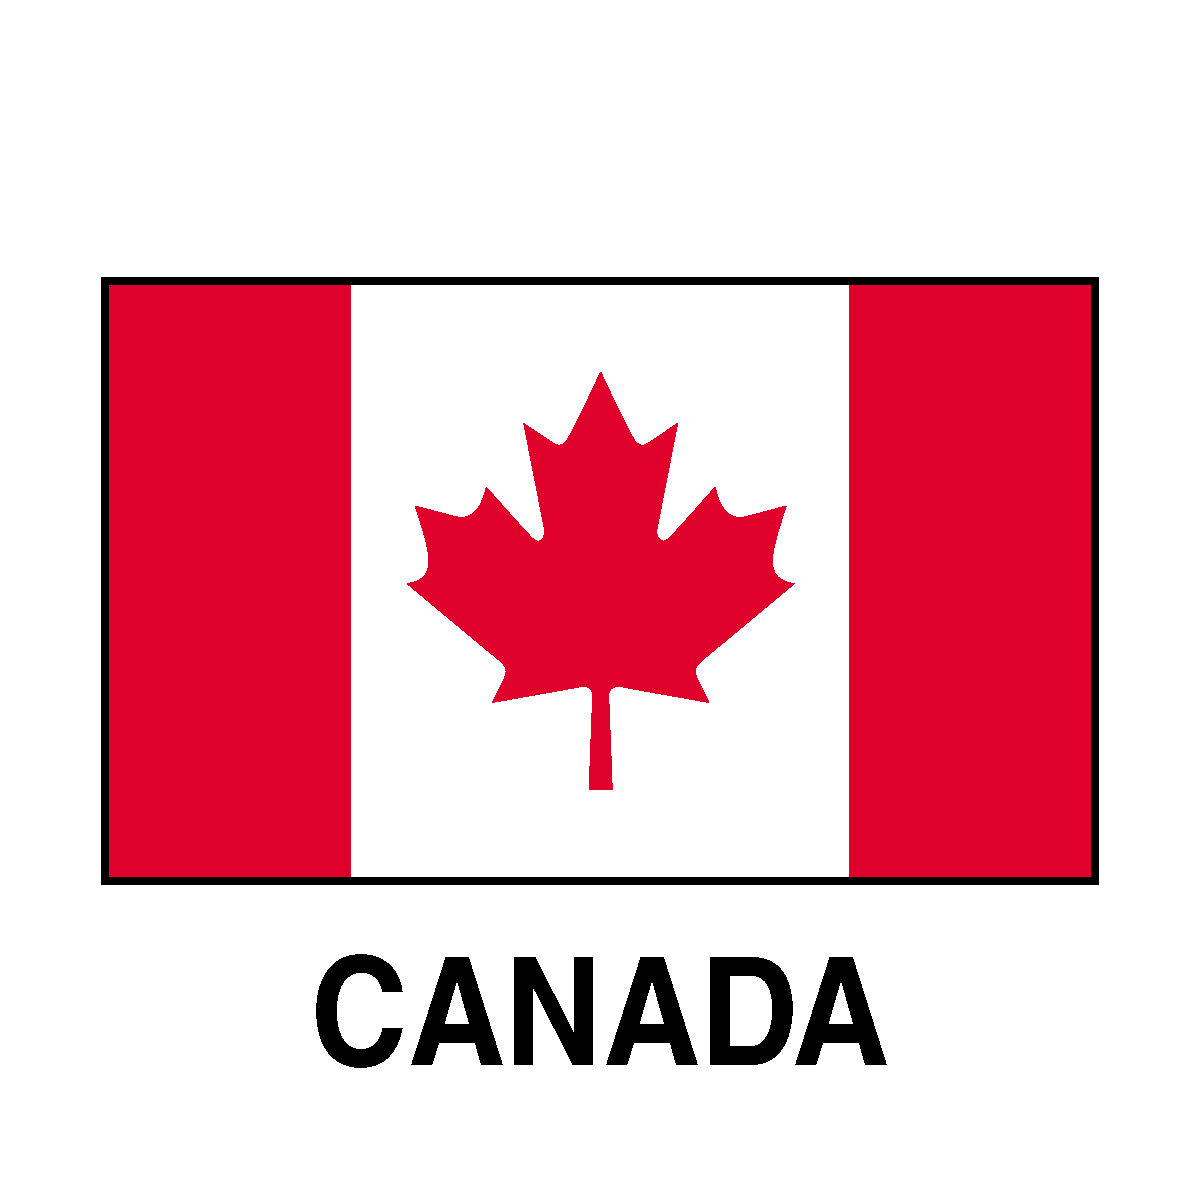 1200x1200 Canada Flag Images Clip Art Dromfed Top